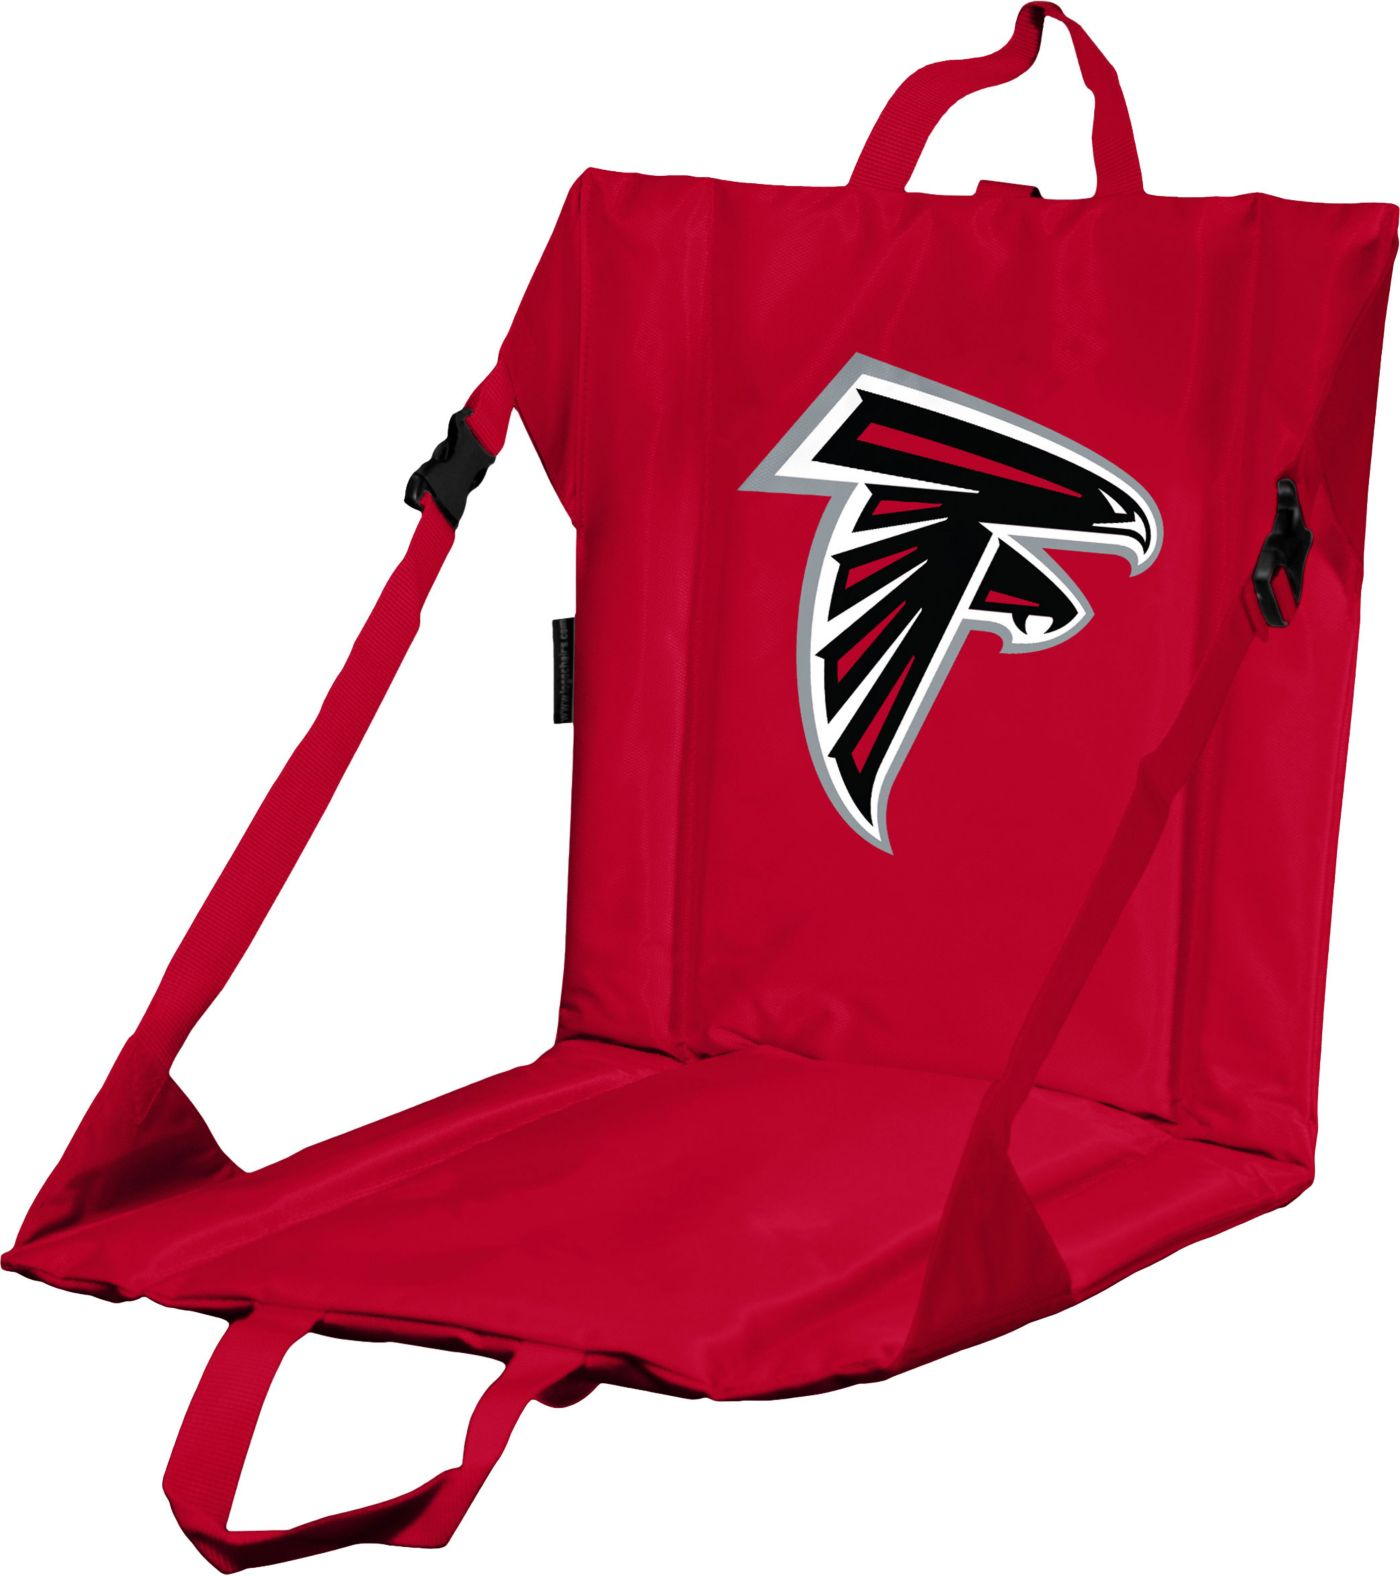 Atlanta Falcons Stadium Seat